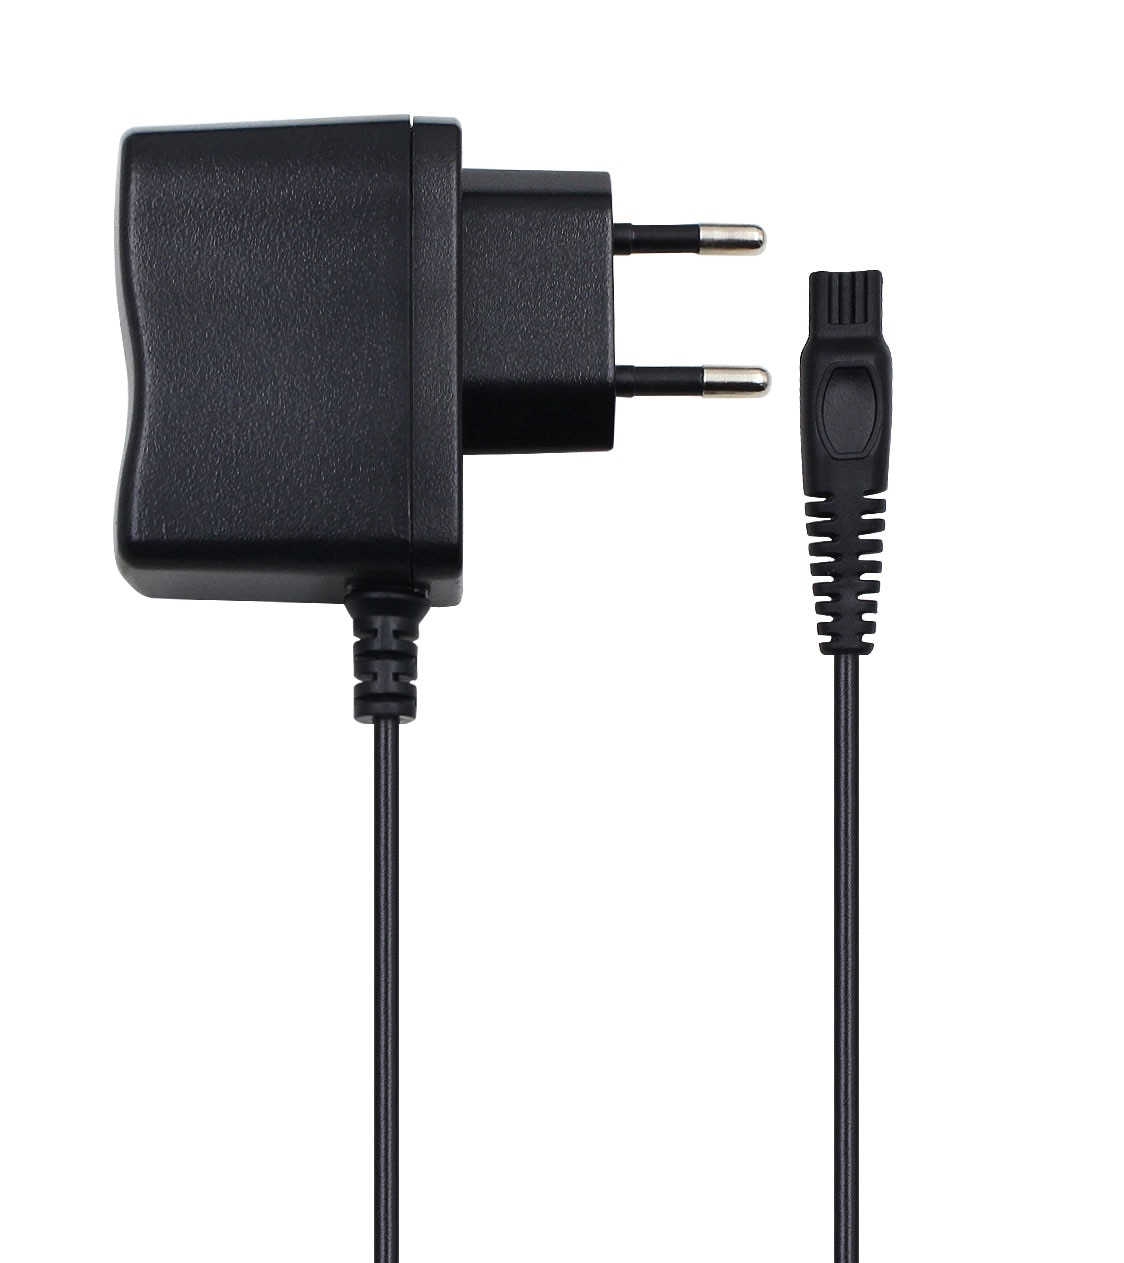 AC/DC Power Adapter Ladegerät Für Philips Hq Multigroom Serie 3100 QG3330